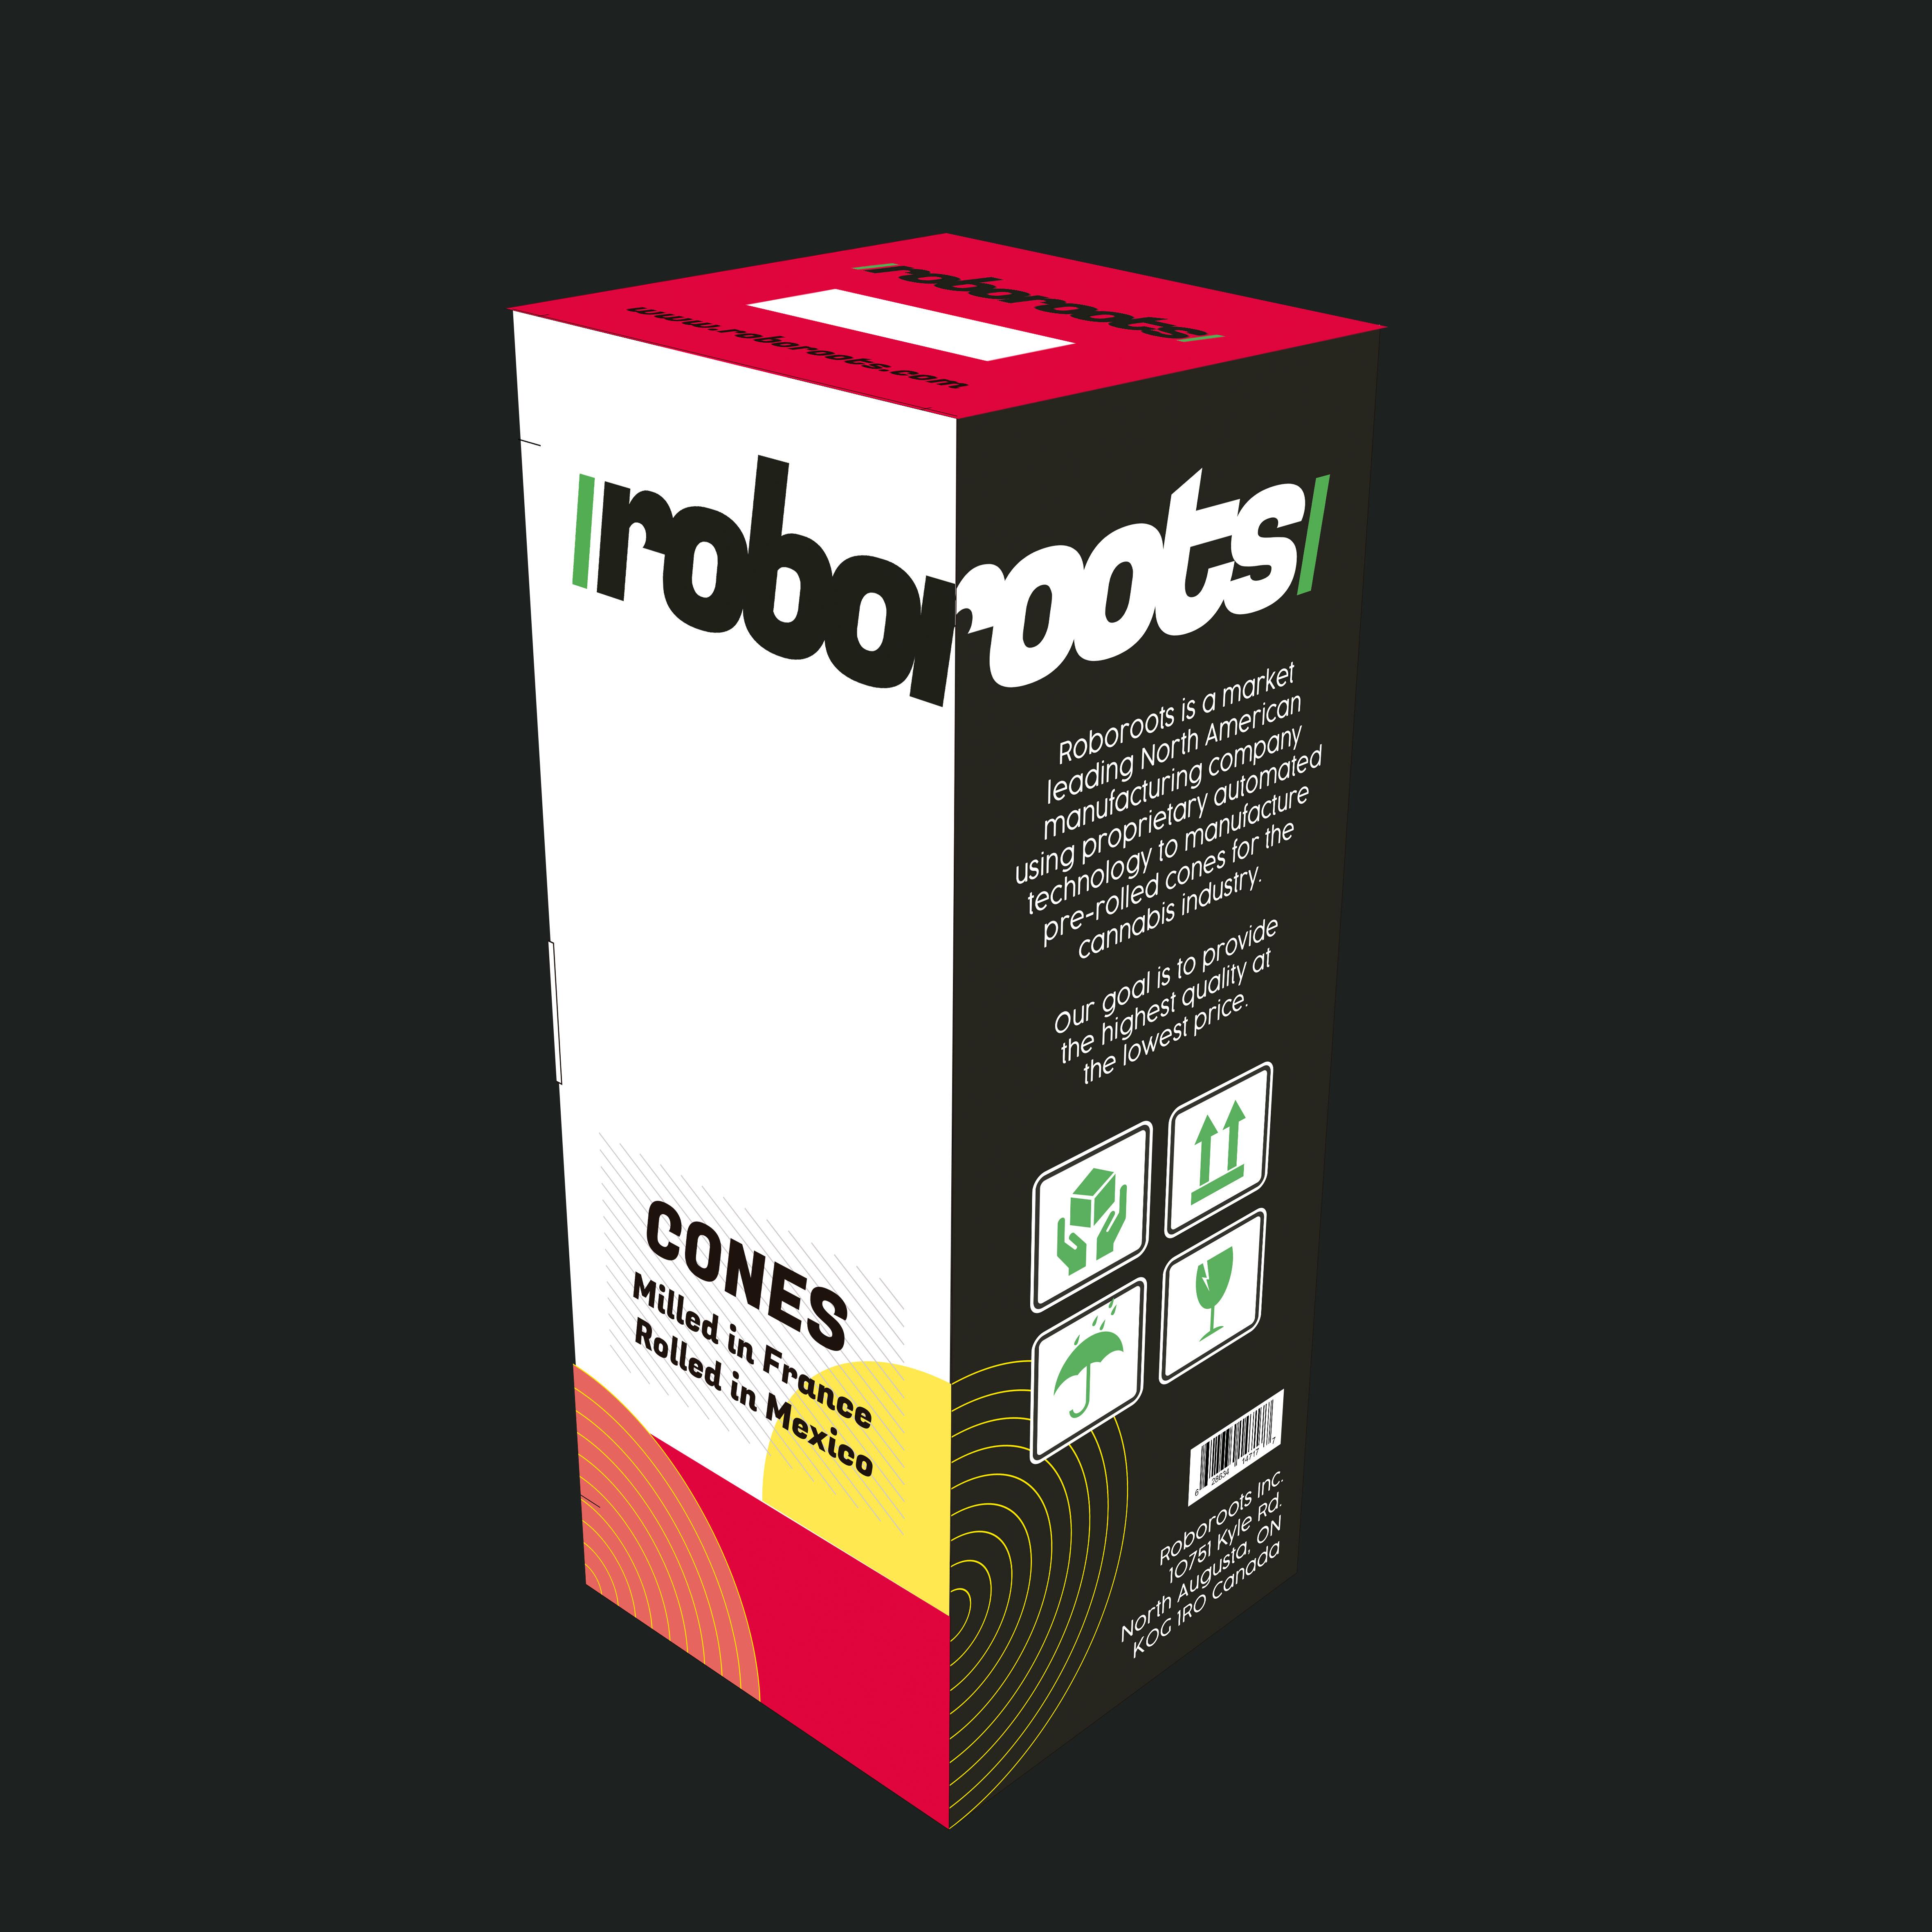 Roboroots unbranded cones - organic hemp